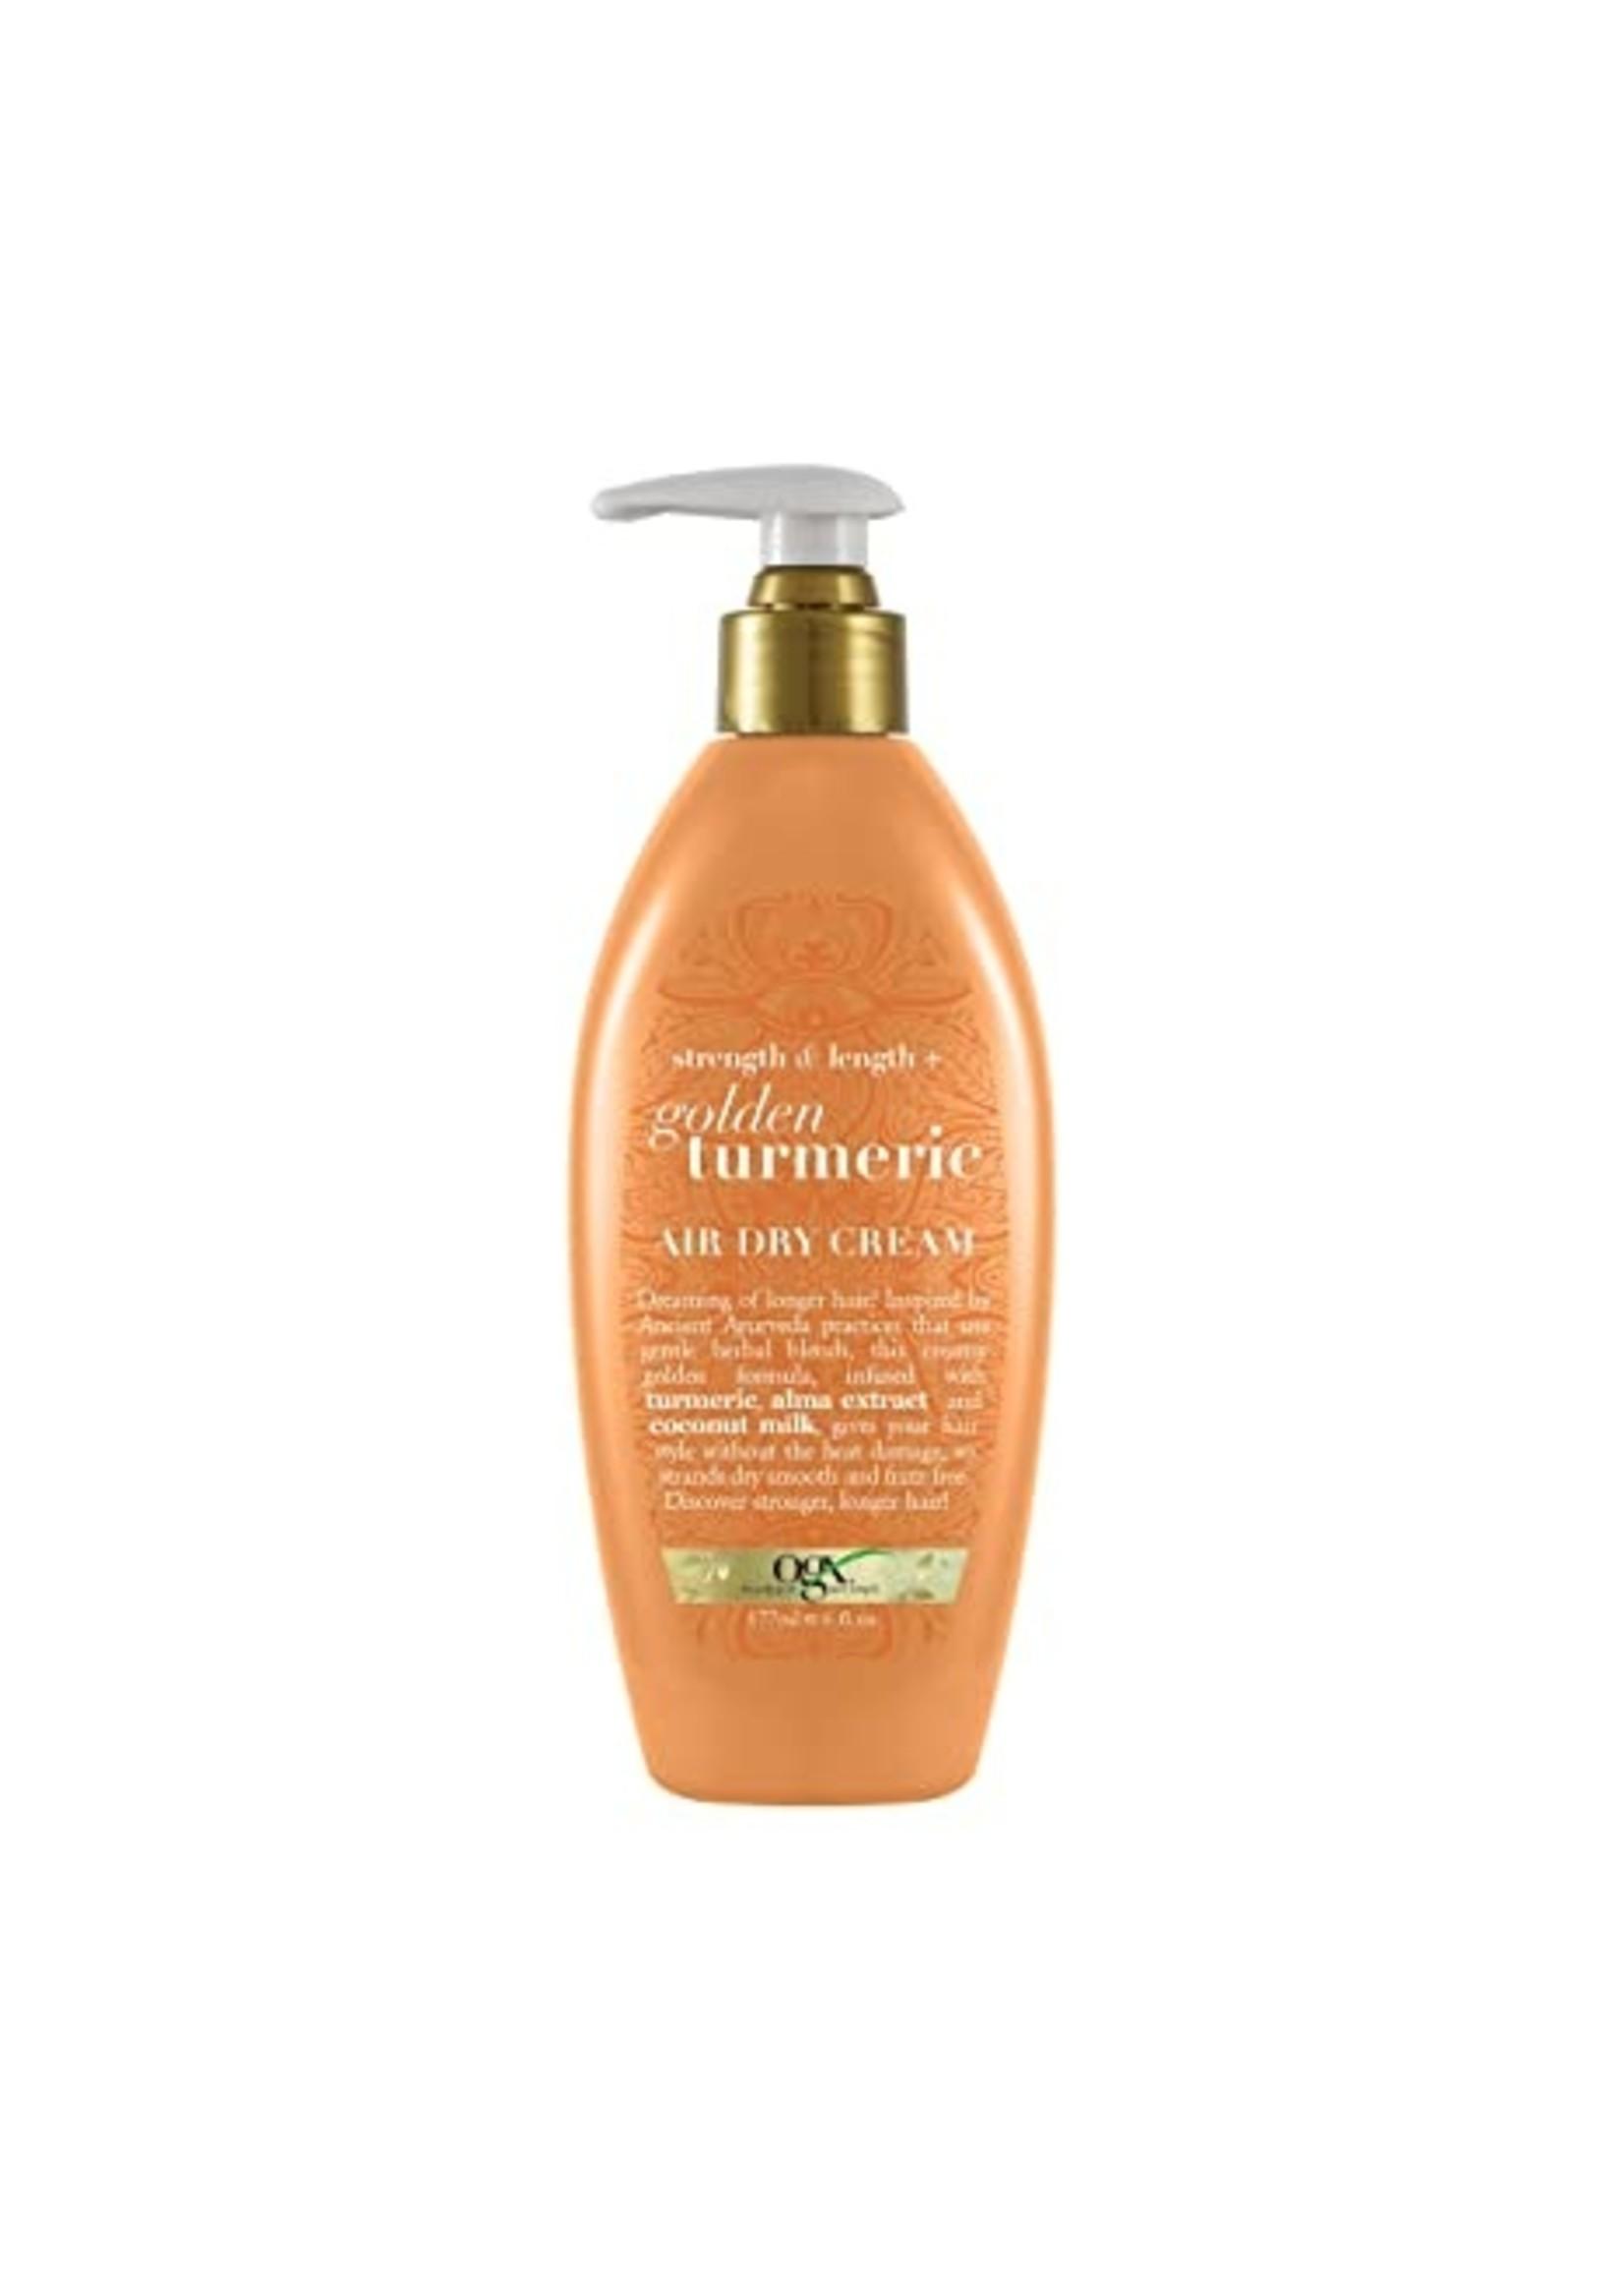 OGX Golden Turmeric Air Dry Cream 6